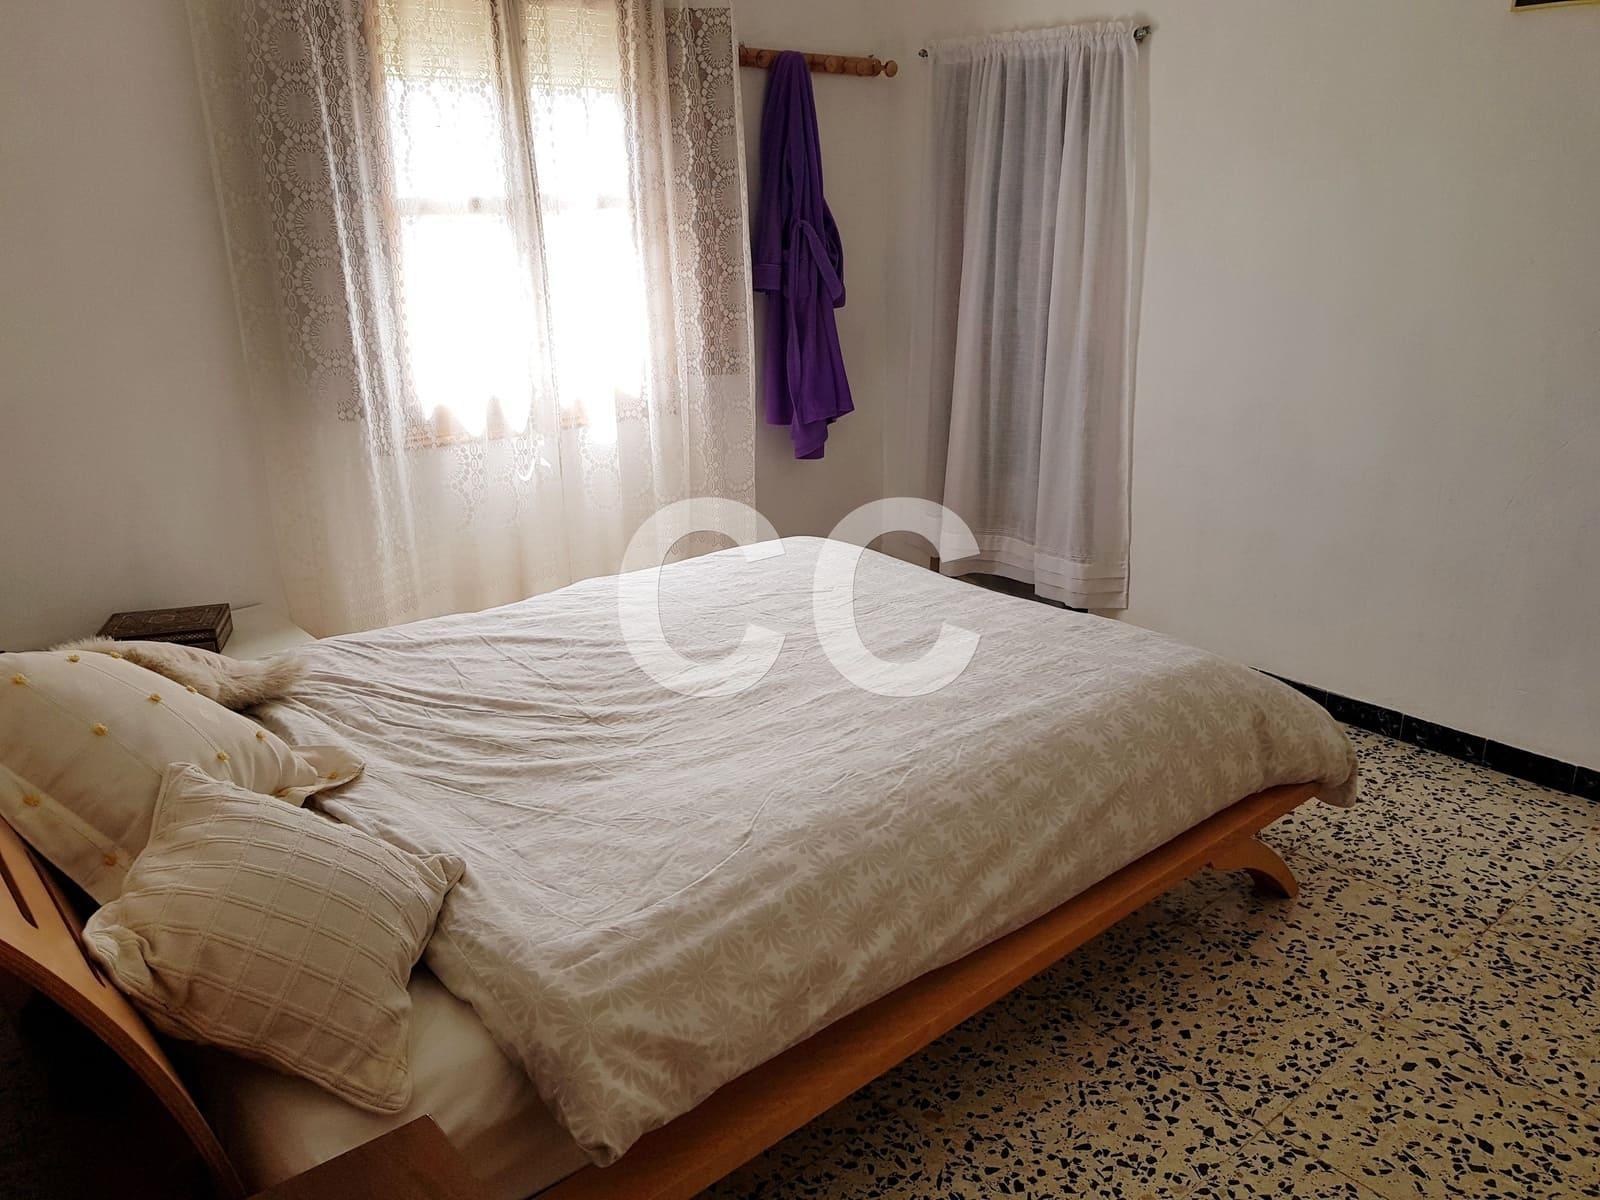 4 quarto Quinta/Casa Rural para venda em Alcala la Real com piscina garagem - 149 000 € (Ref: 5462608)